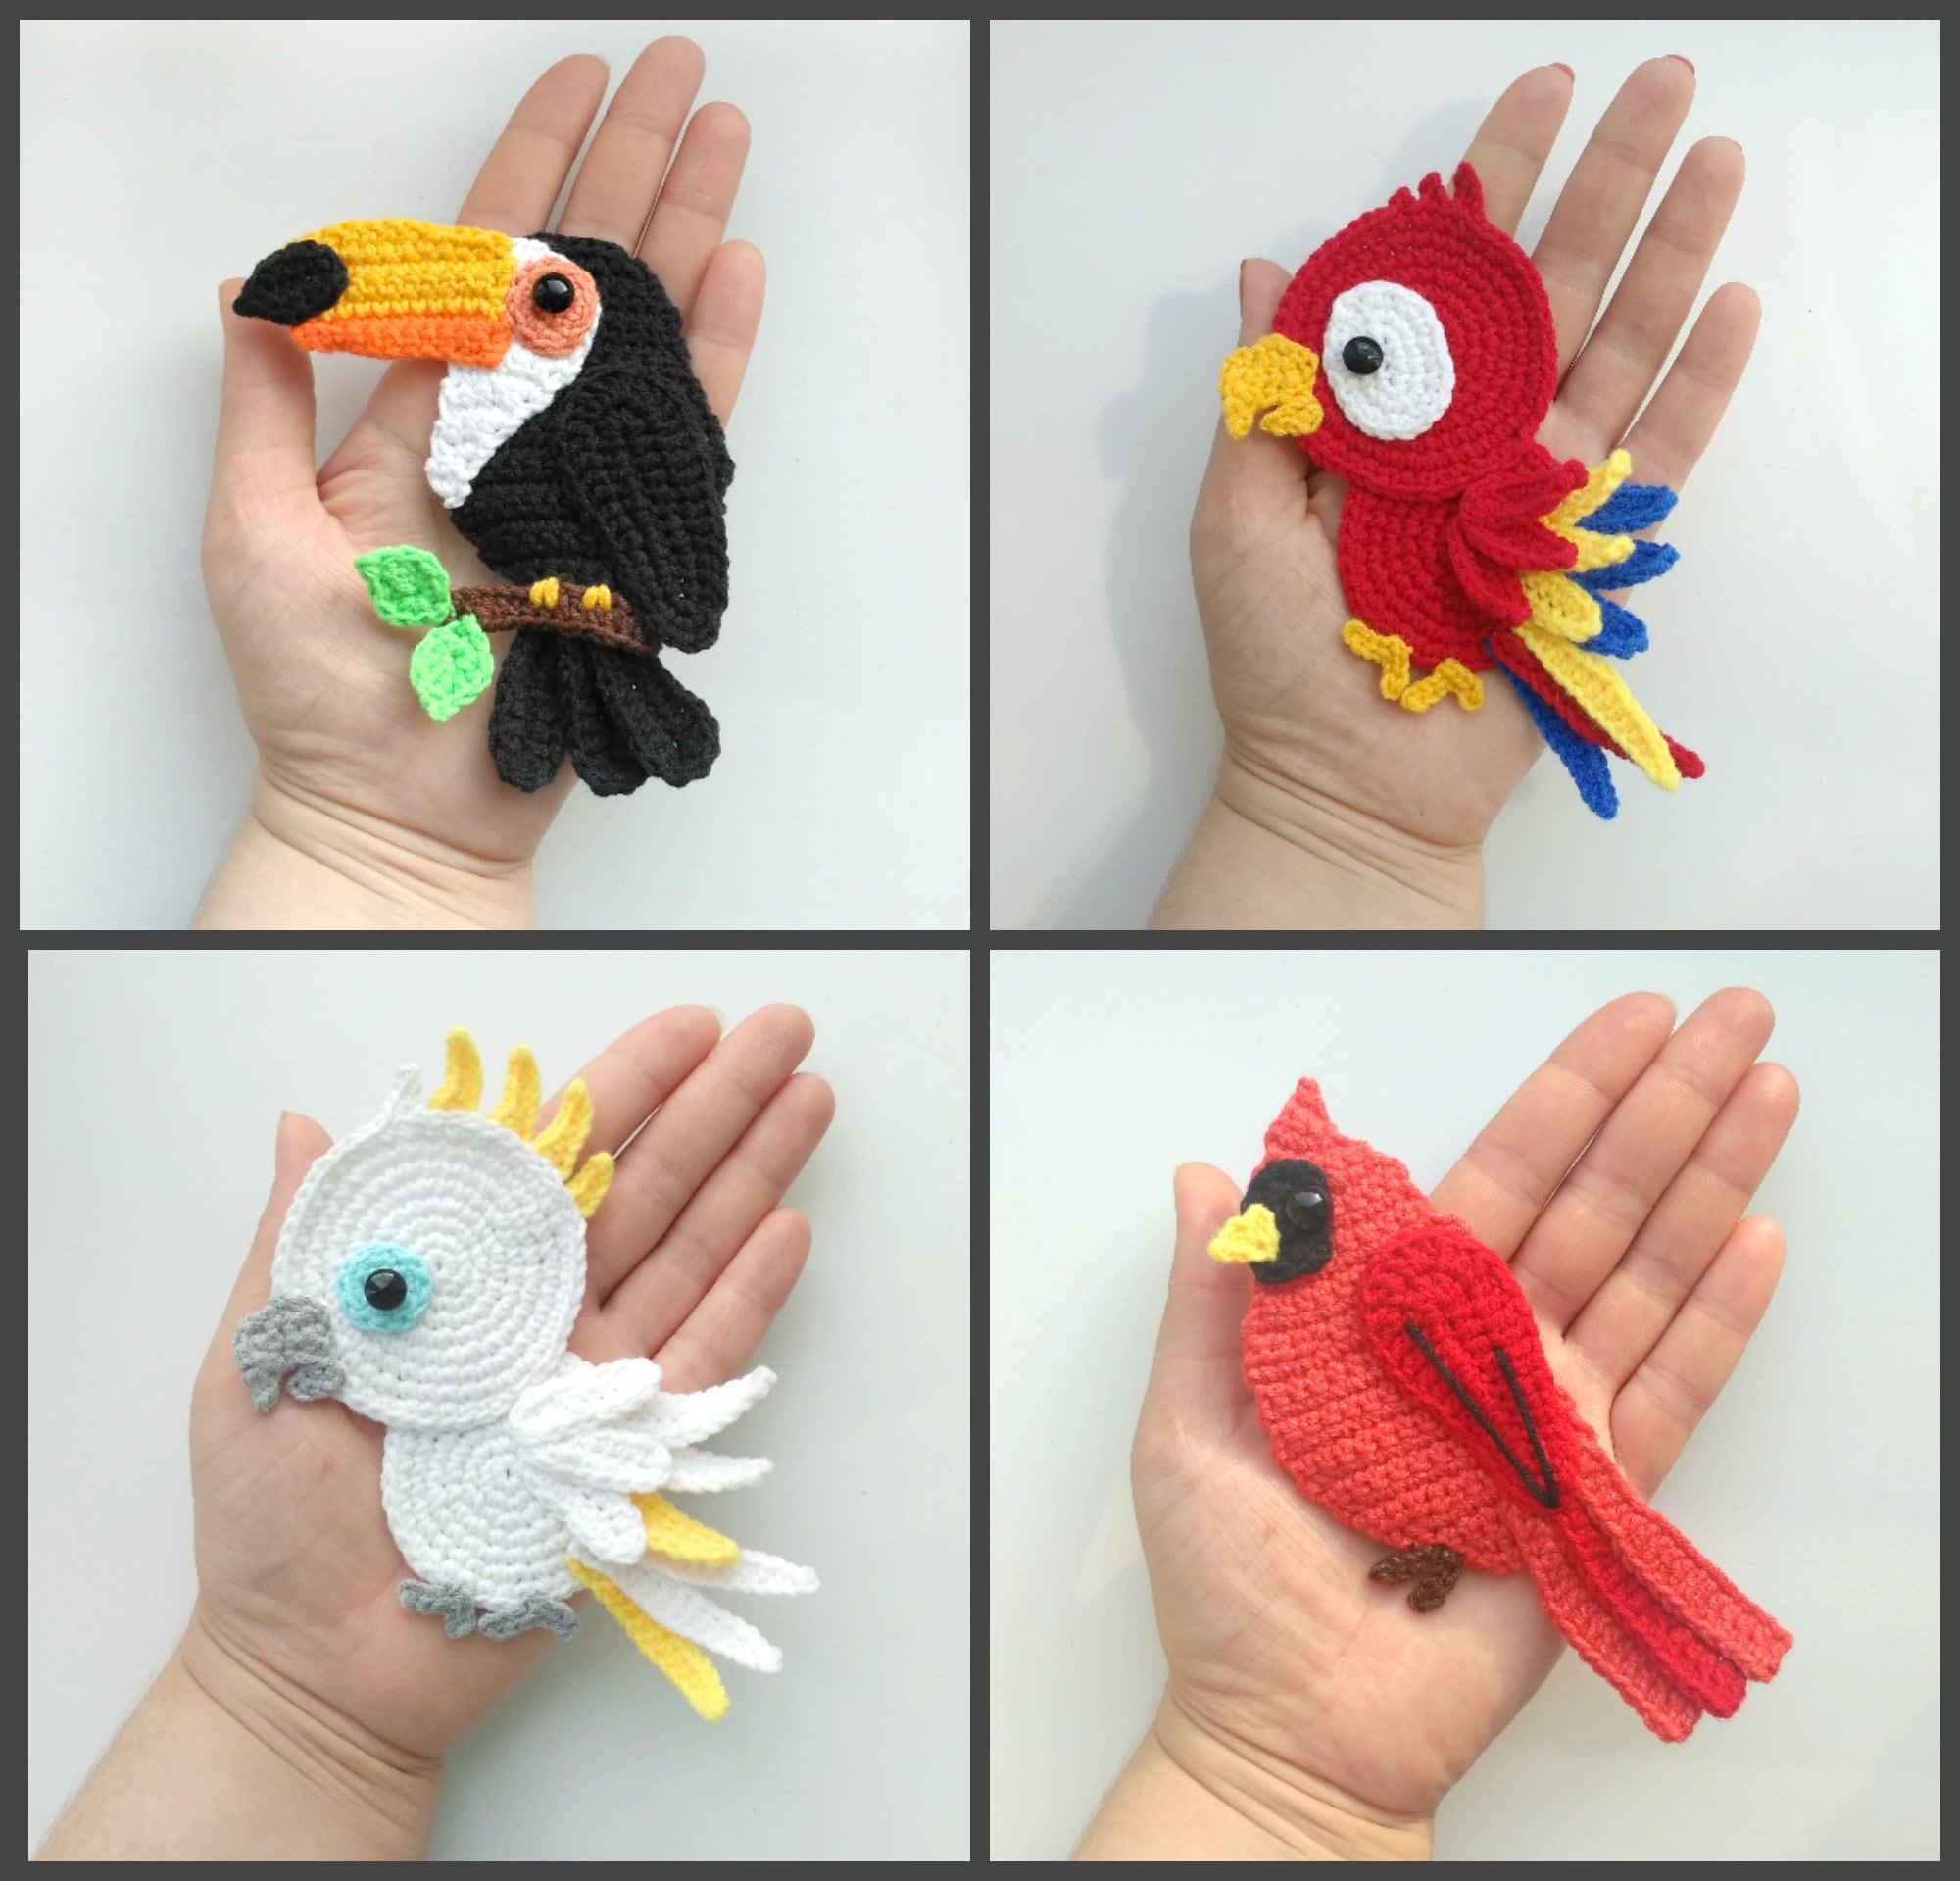 Pattern Tropical Birds Applique Crochet Patterns Pdf Toucan Etsy